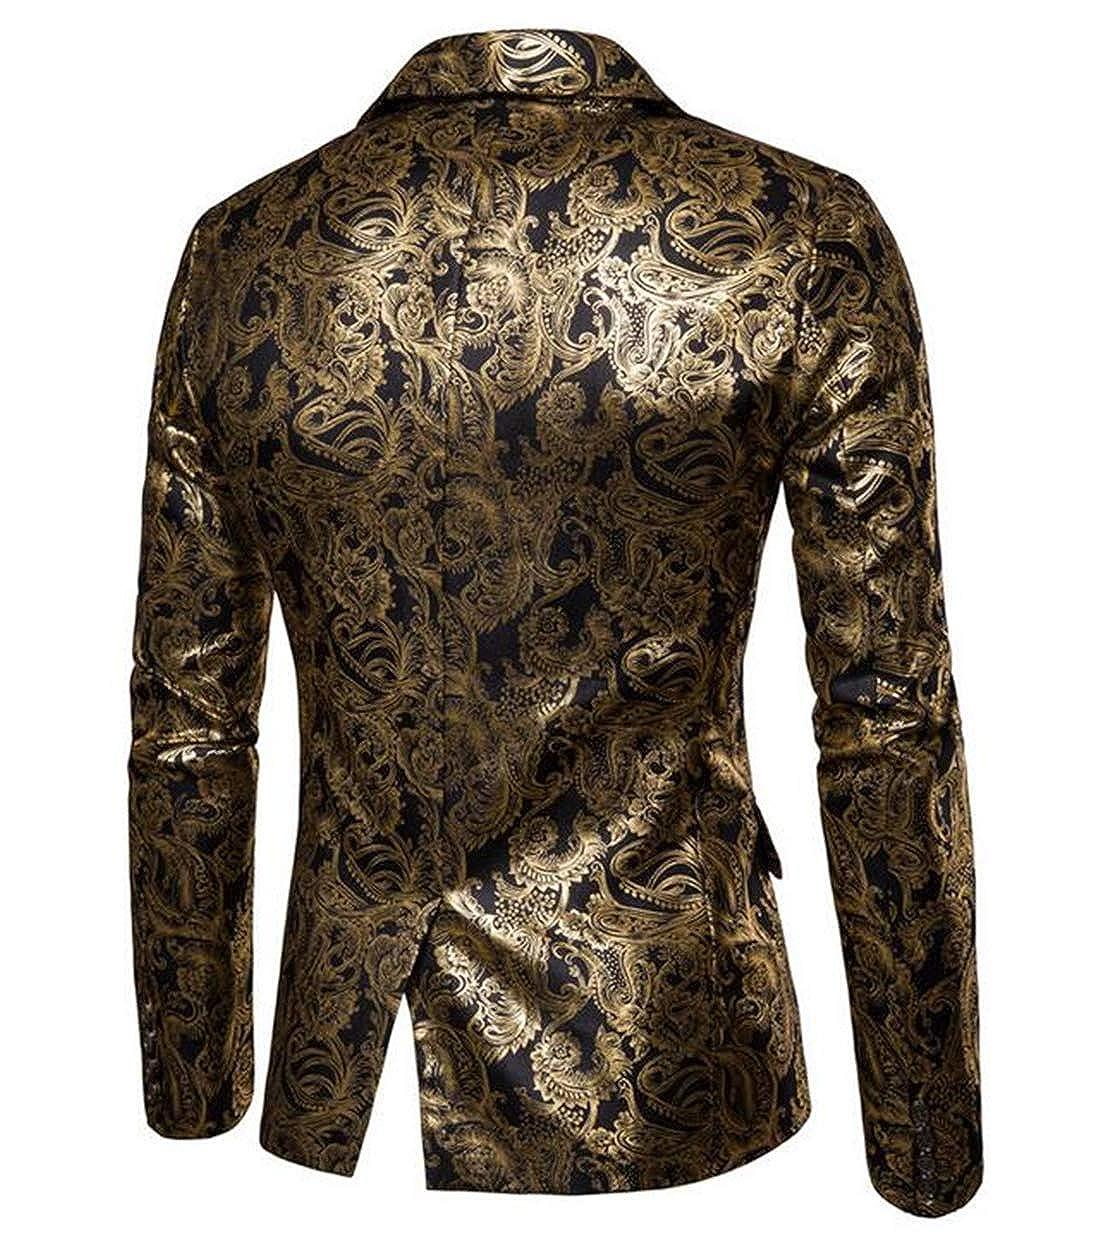 Spirio Men Leopard Print Warm Slim Fit Crewneck Casual Long Sleeve T-Shirts Tops